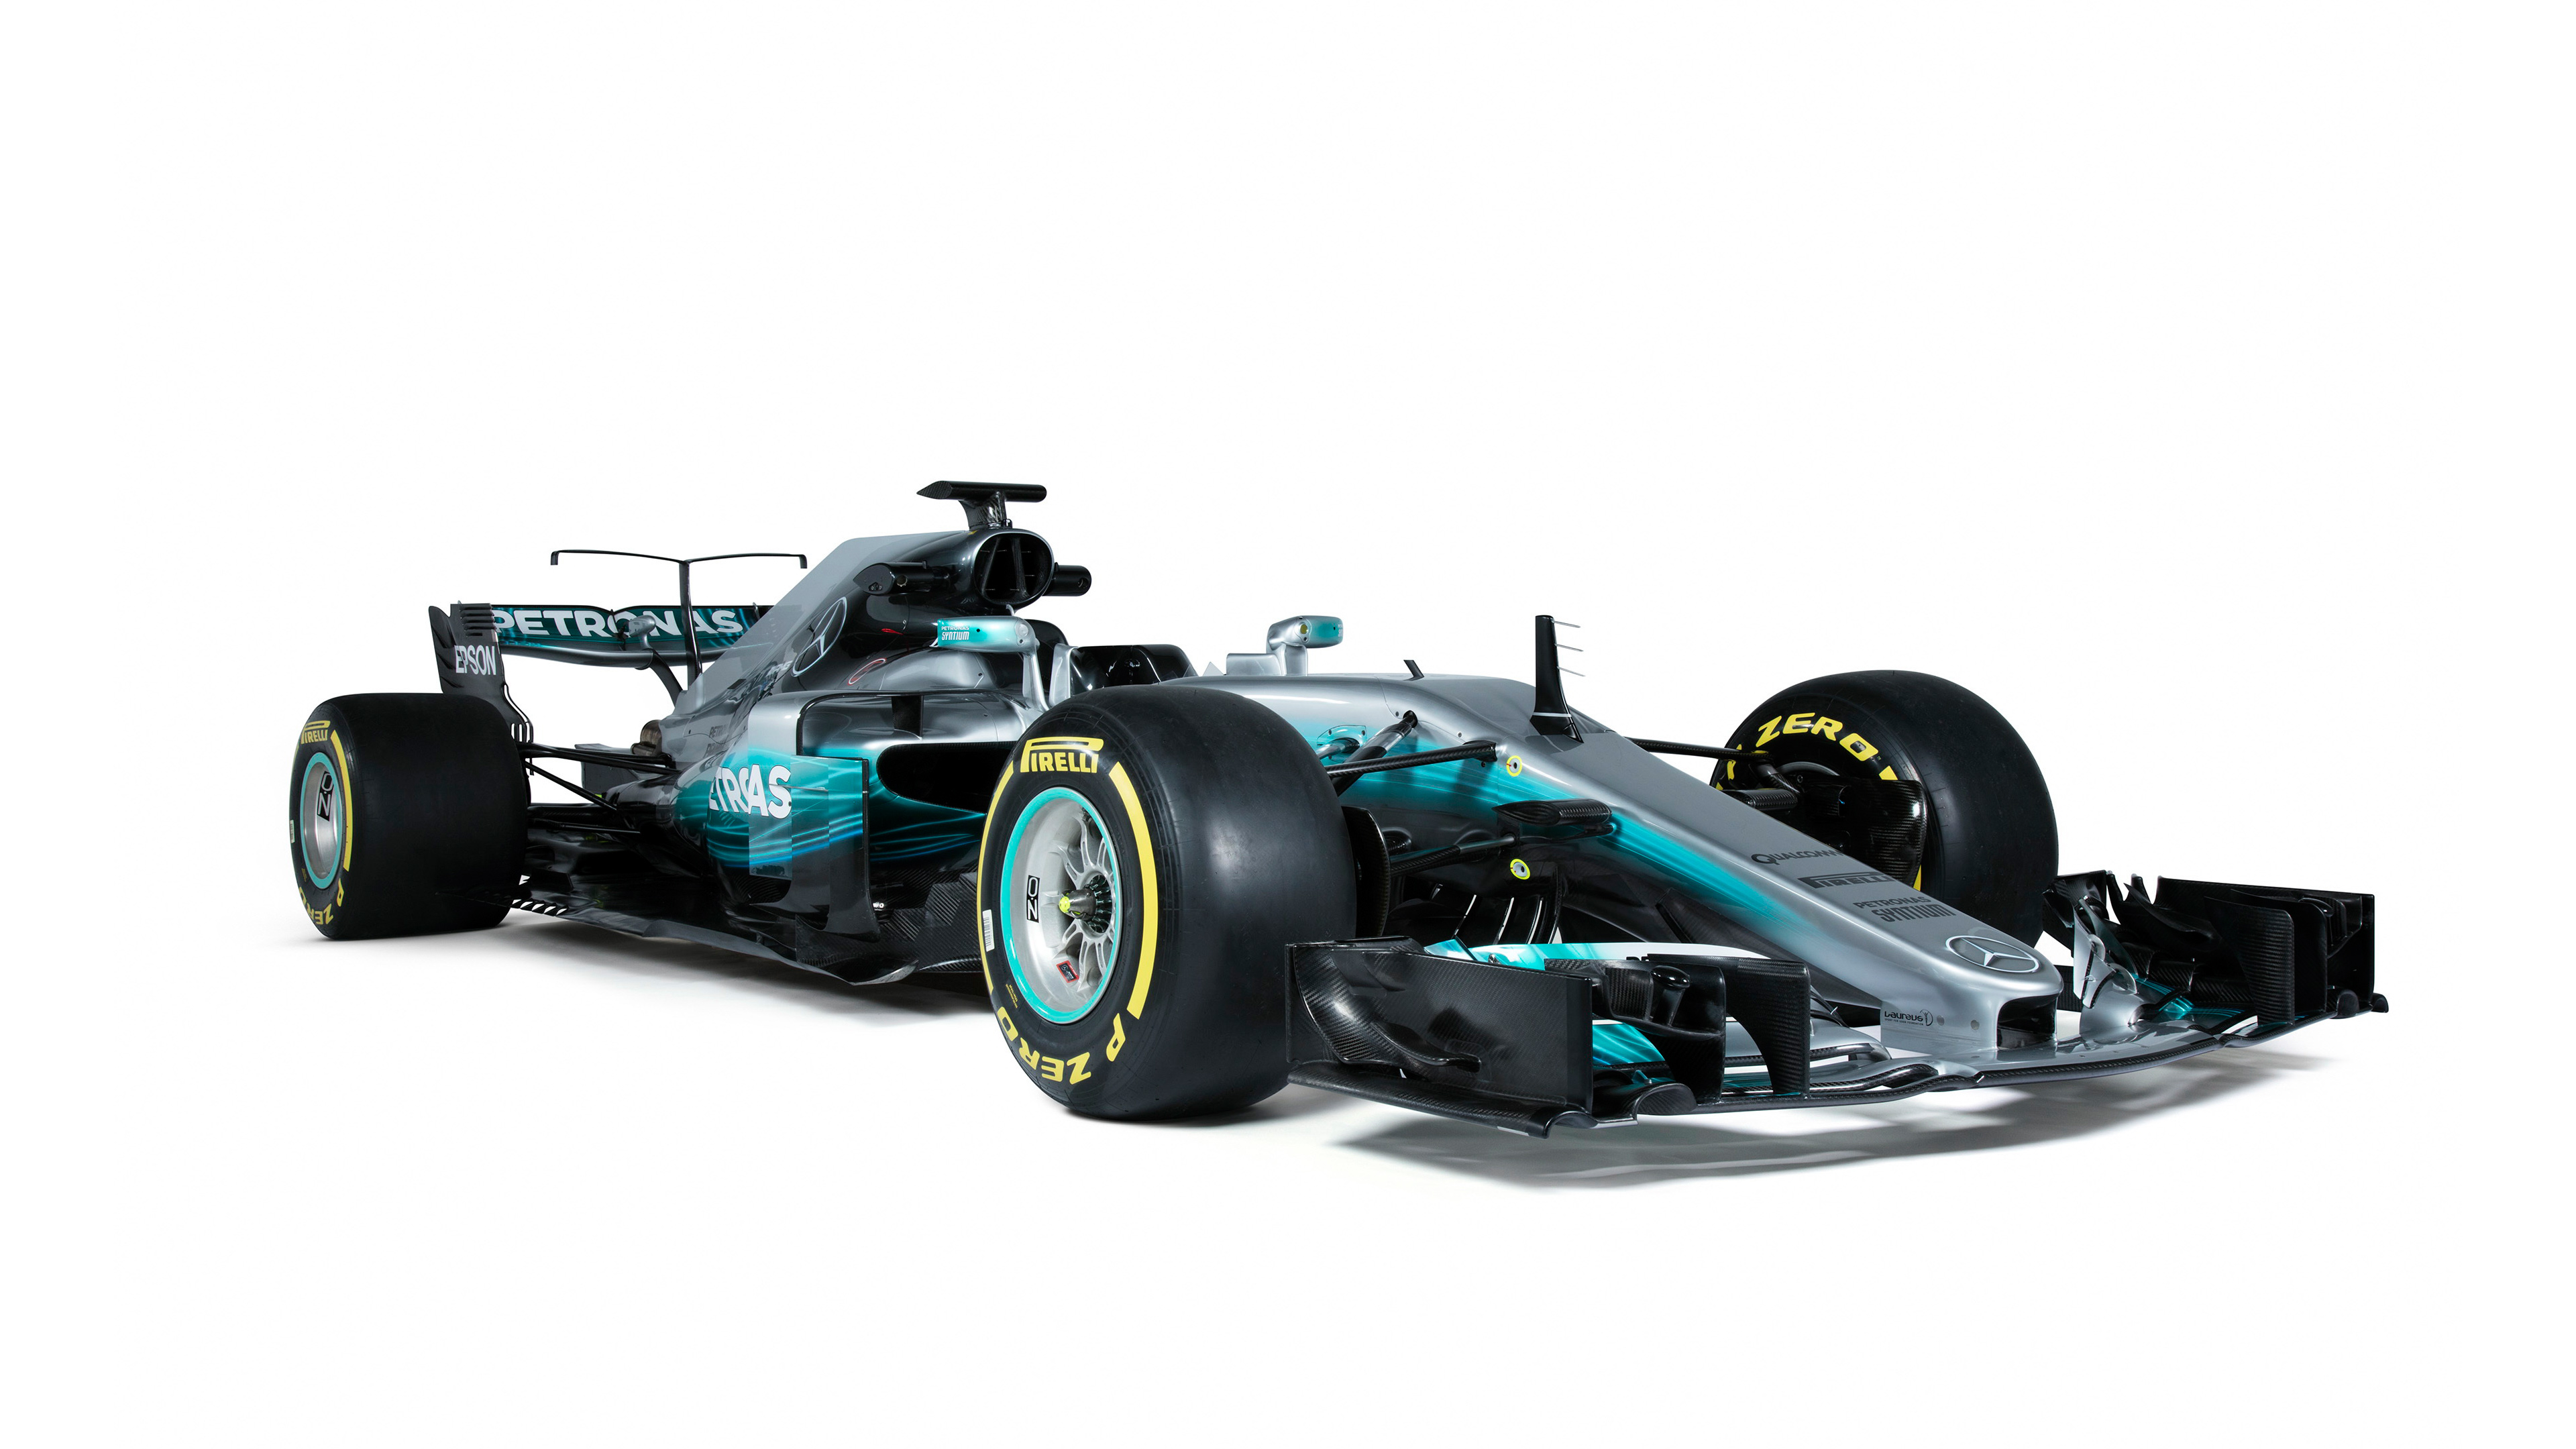 Mercedes amg f1 w08 wallpaper 7